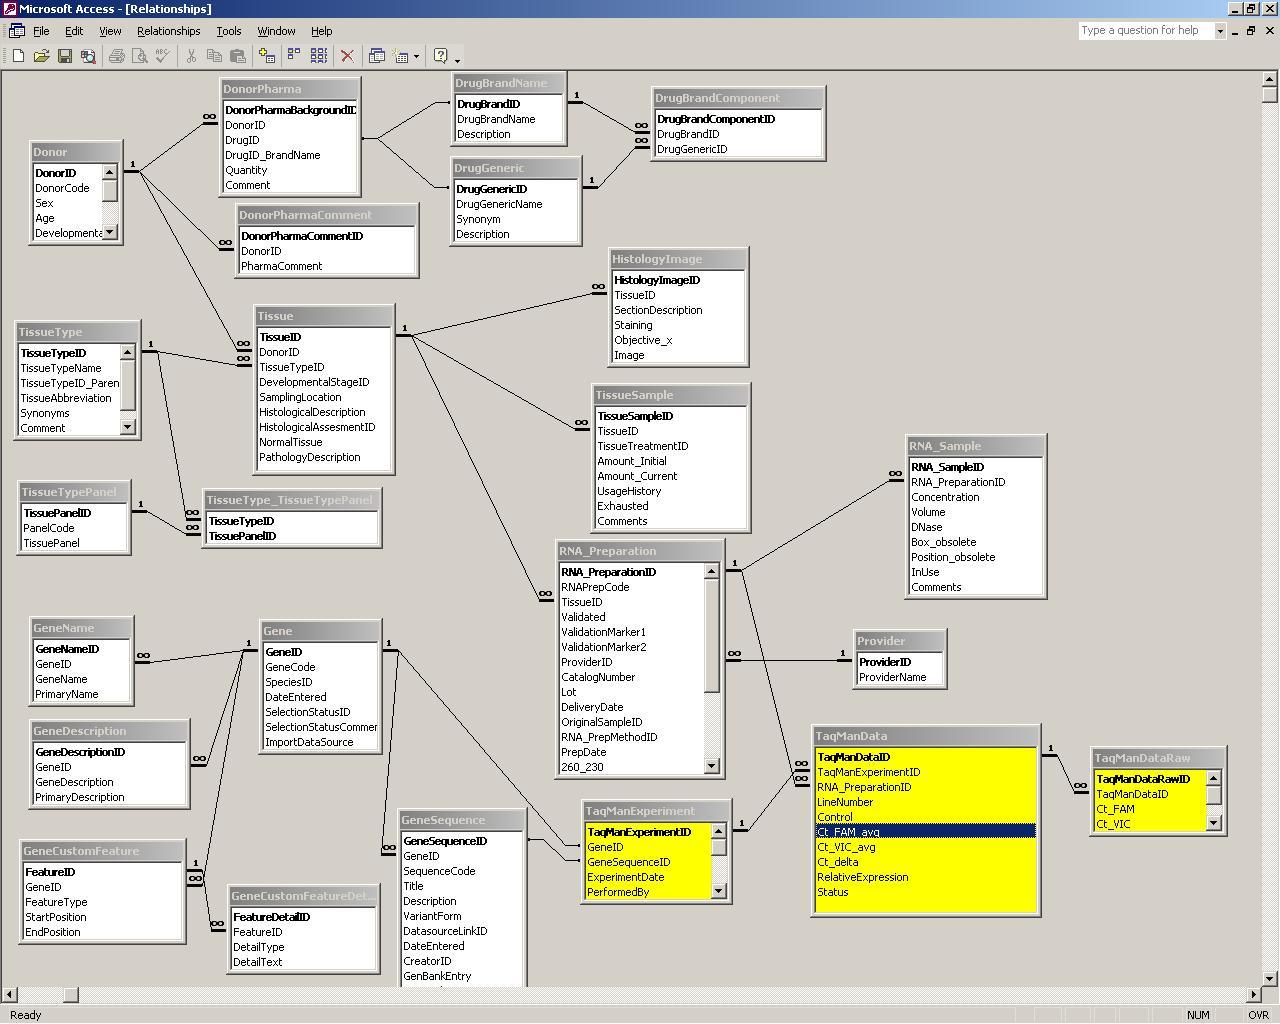 microsoft access relationship diagram  microsoft  free database diagram table relationships database table diagram tool